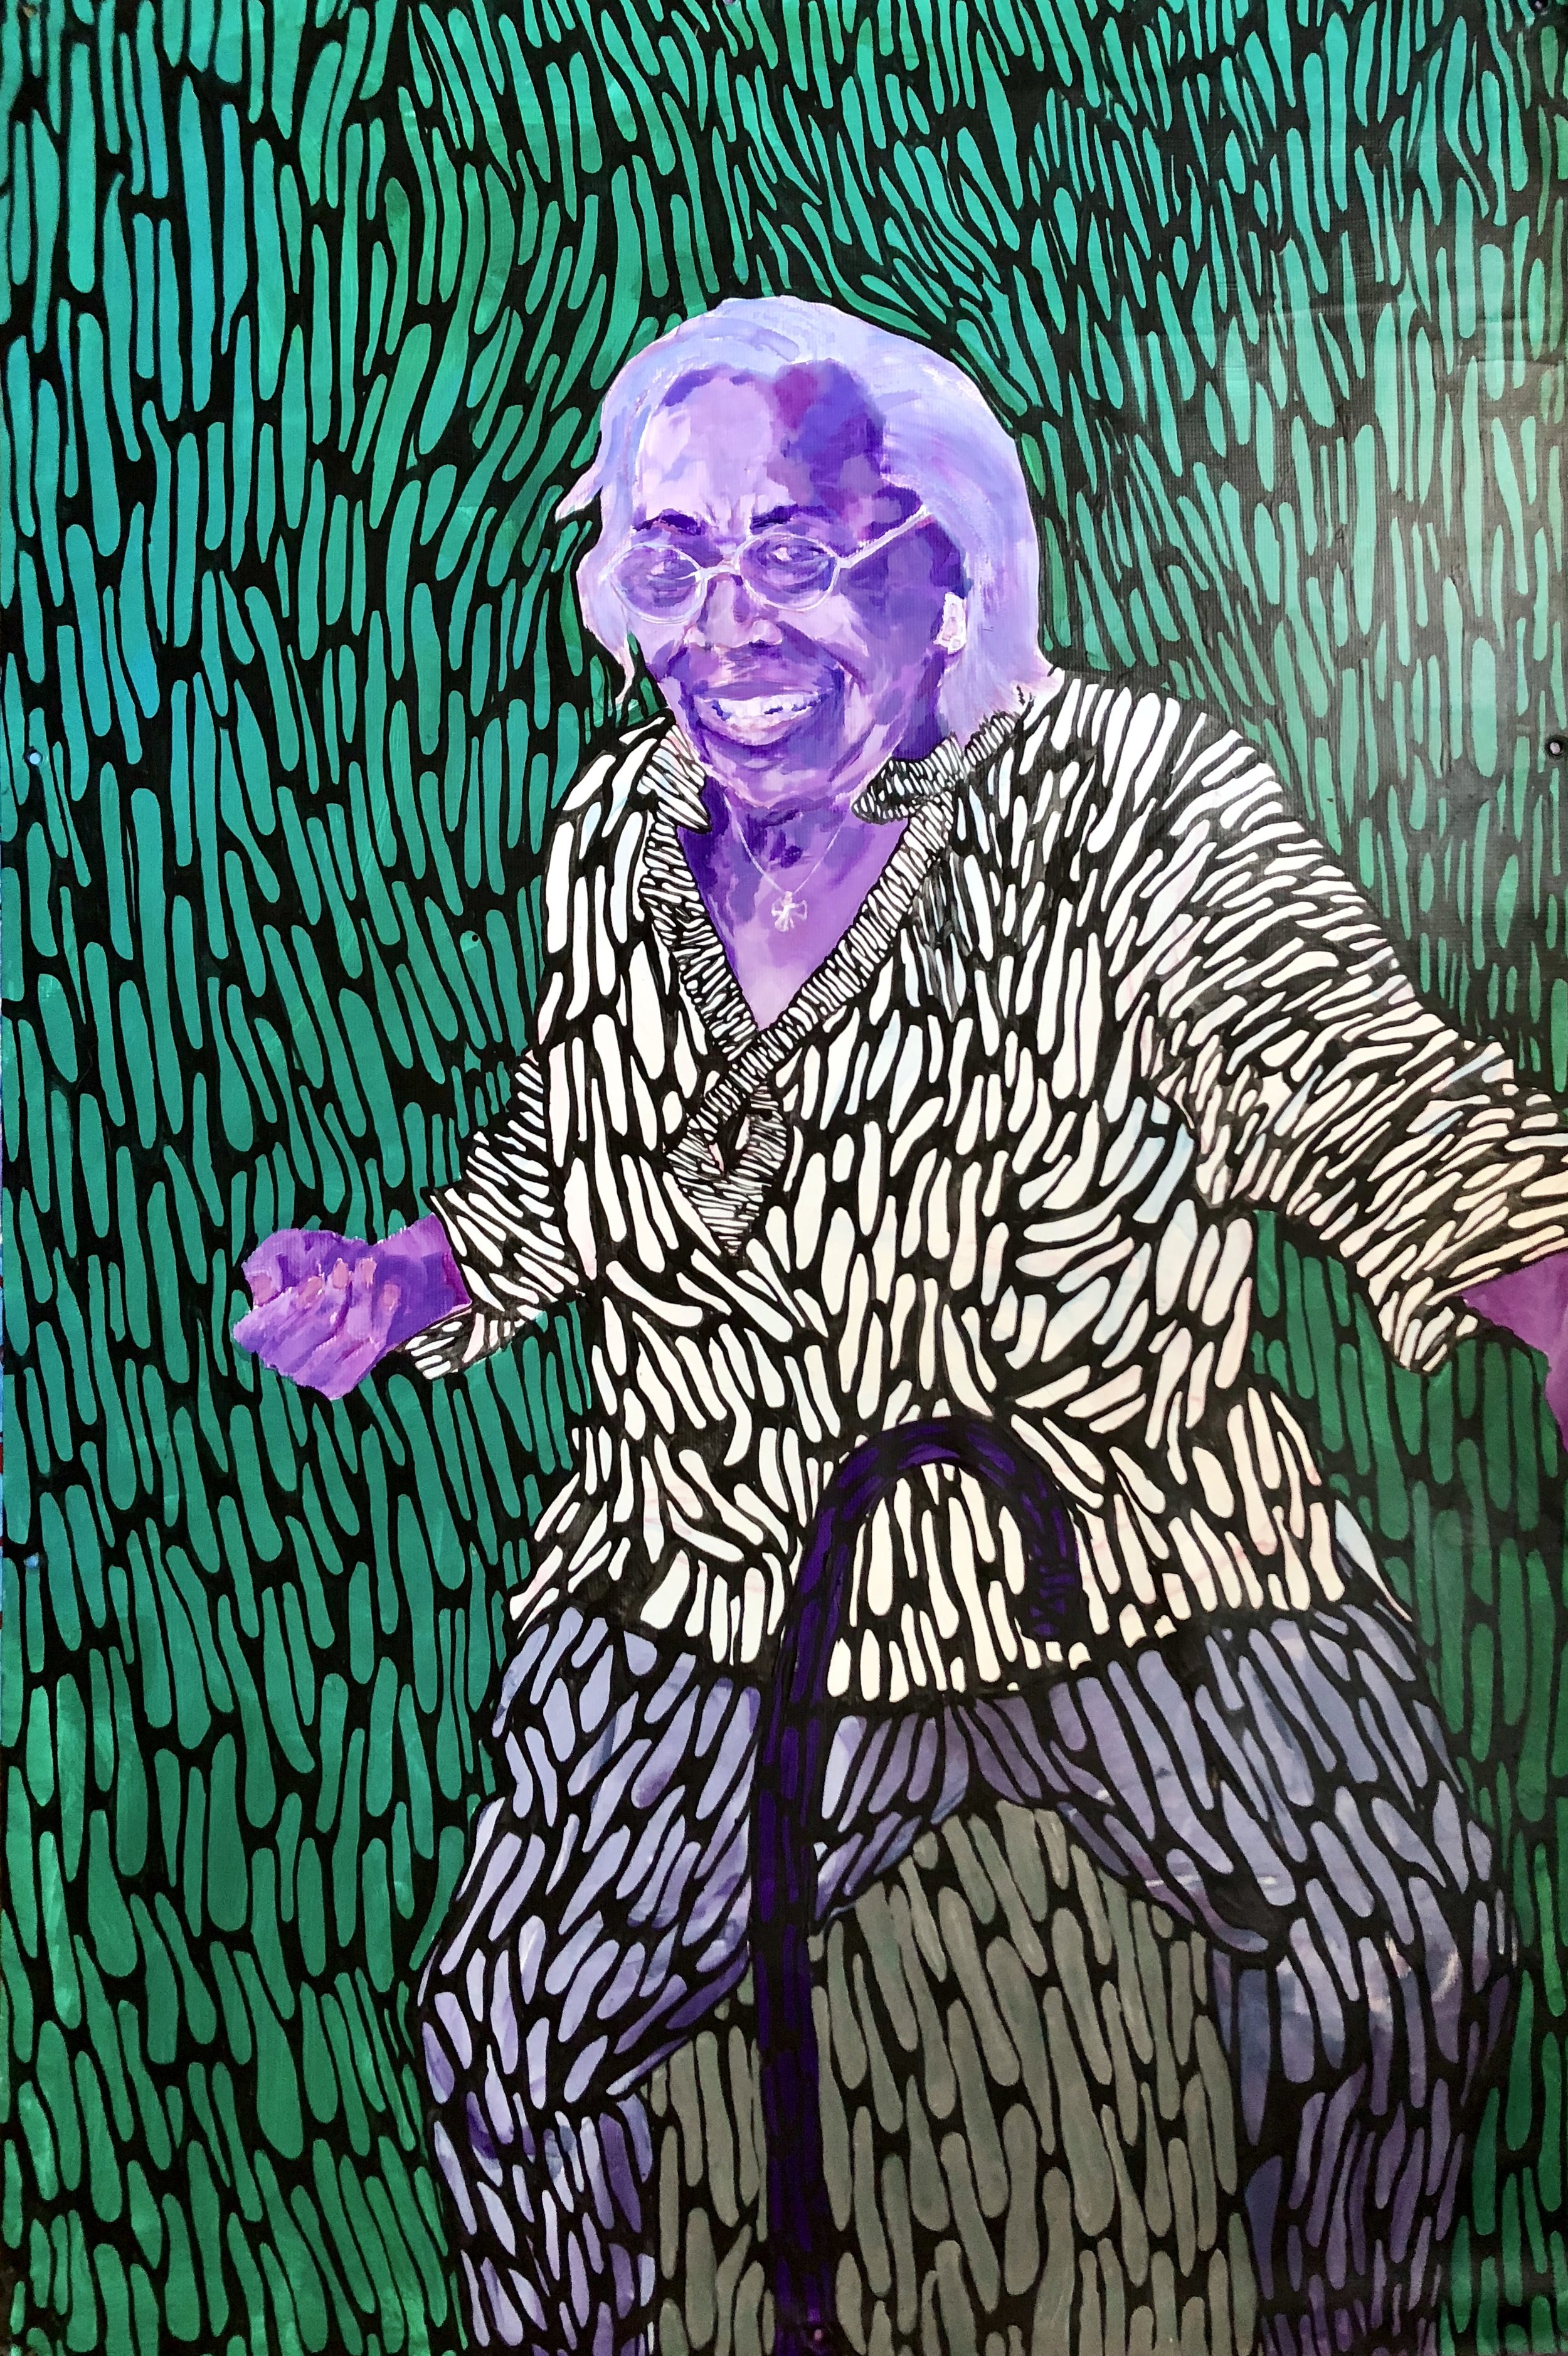 Ms. Jimmie -- Elizabeth Catlett -- Sharecropper, 1952